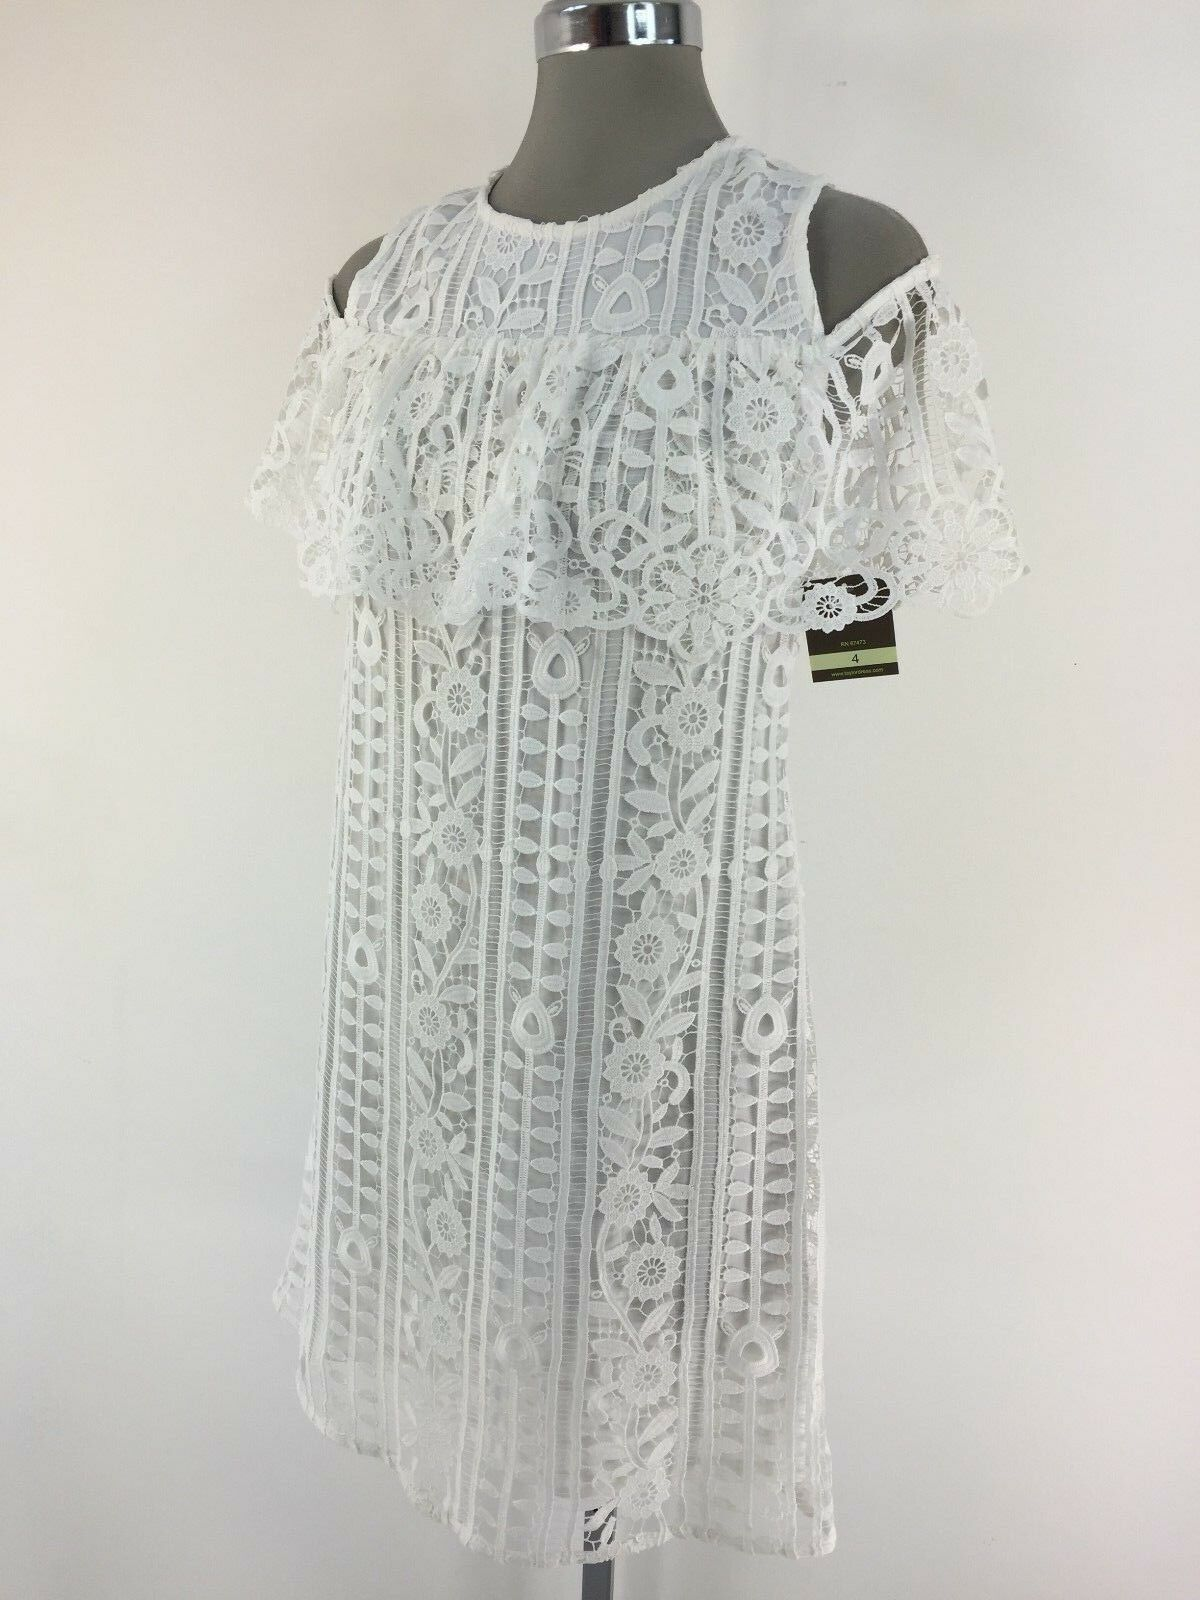 Taylor NEW Elegant and Modern Cream Crochet Knit Cold Shoulder Dress 4 6 10 12